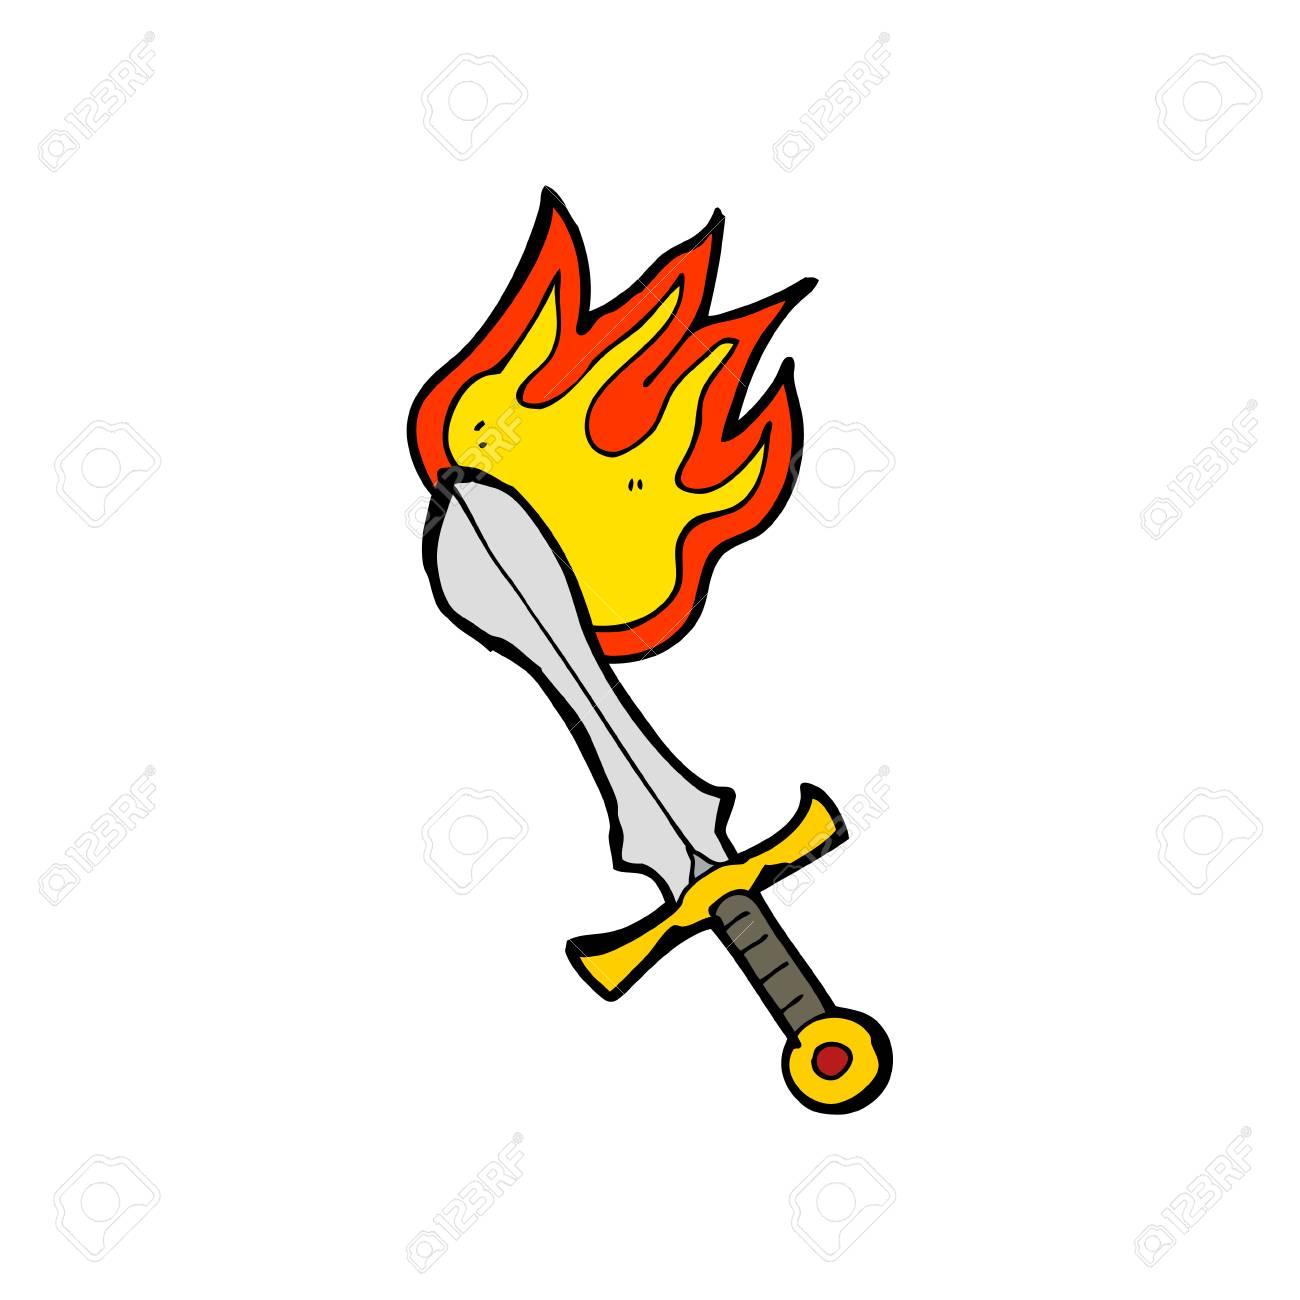 cartoon flaming sword.